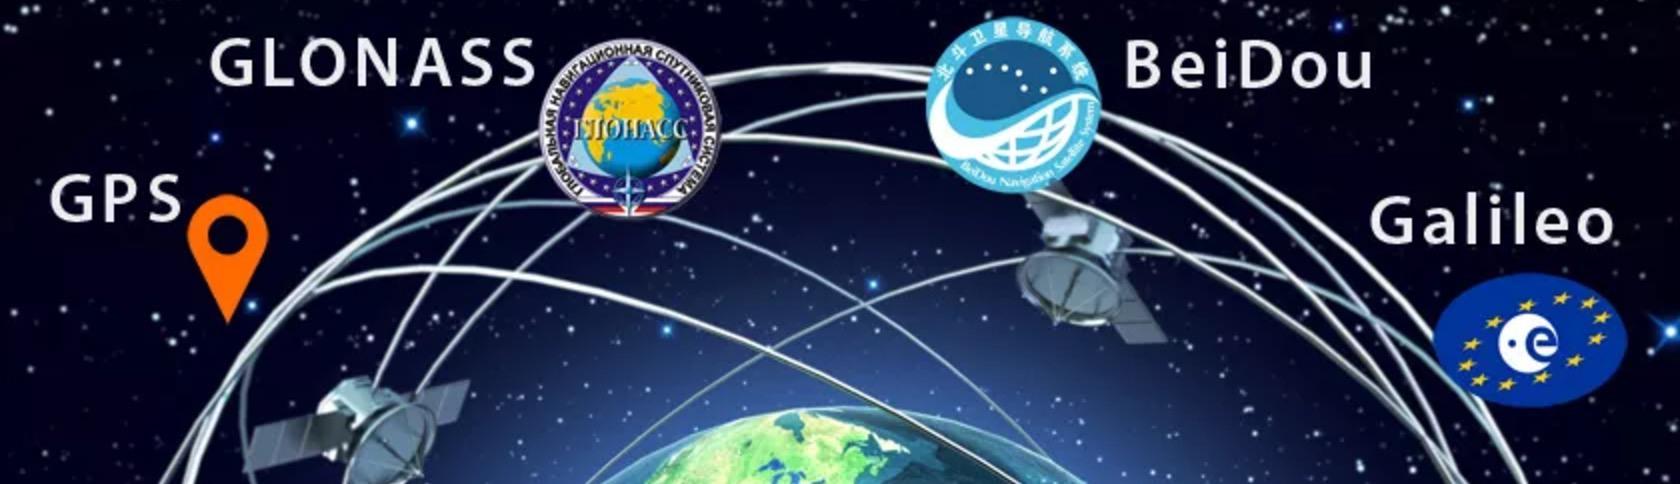 Sistemas De Navegación Actuales